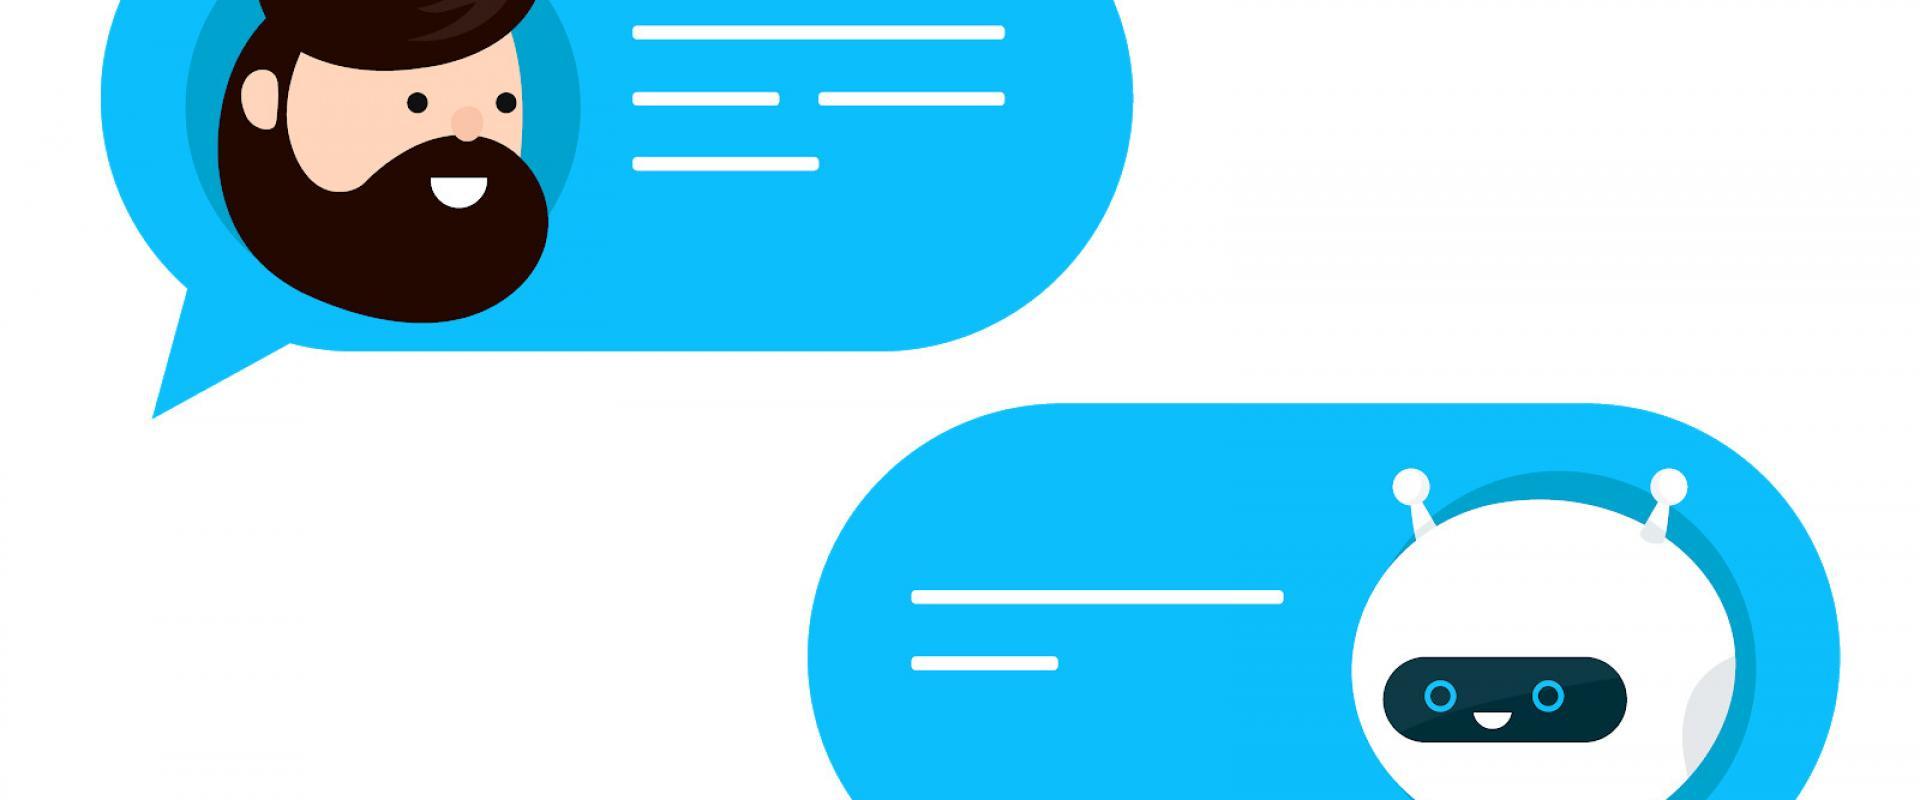 Chatbot cosa sono chatbot cosa sono - chatbot come funziona 1 - Chatbot cosa sono e come funzionano